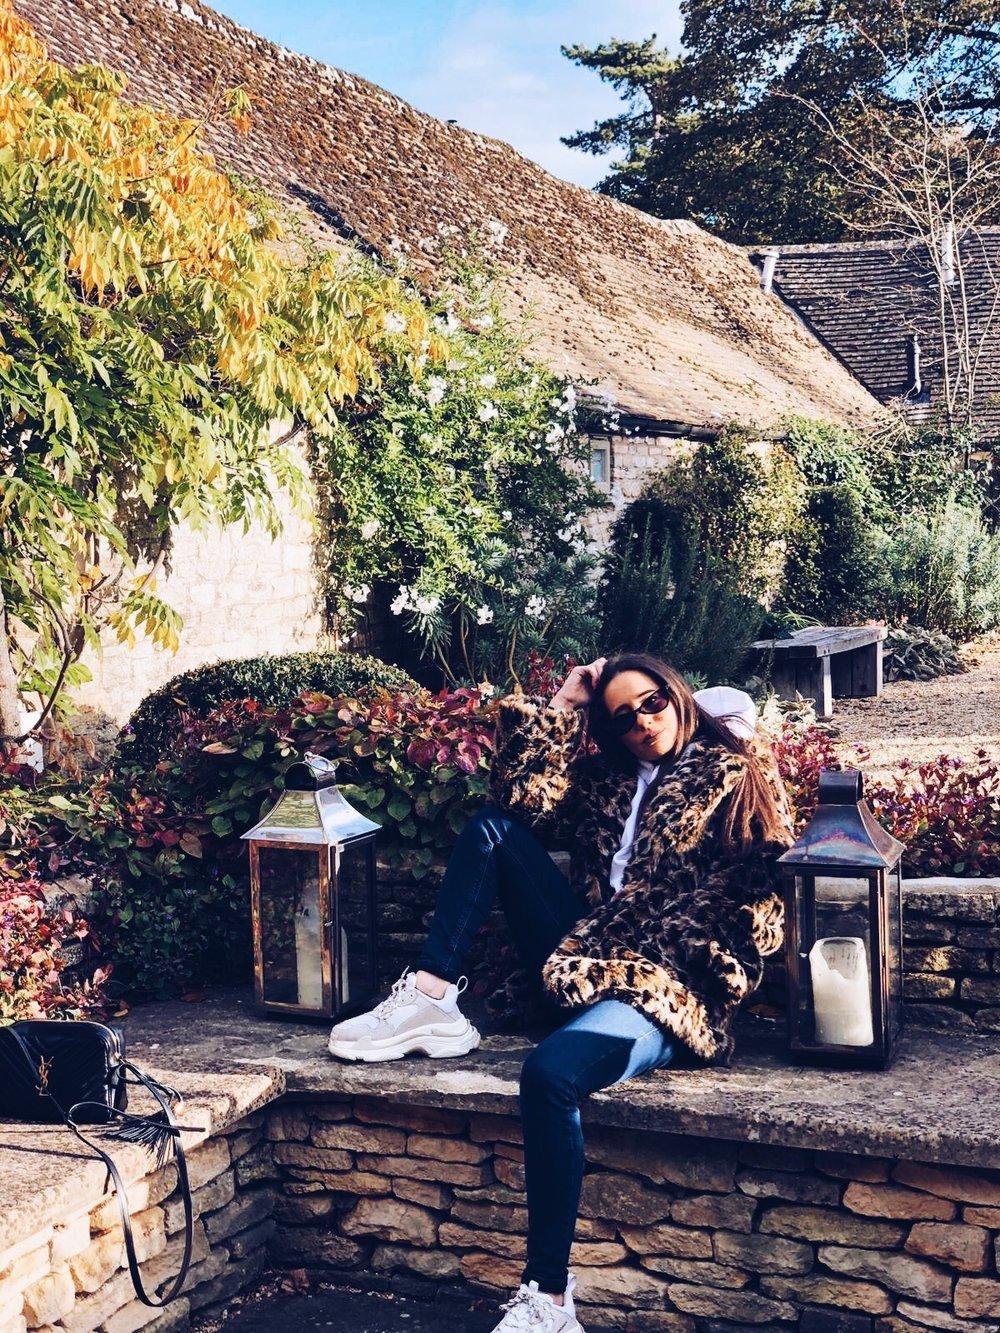 A Wears   Leopard Coat - H&M    Bag - YSL    Sunglasses - Balenciaga    Trainers - Balenciaga    Jeans - J Brand